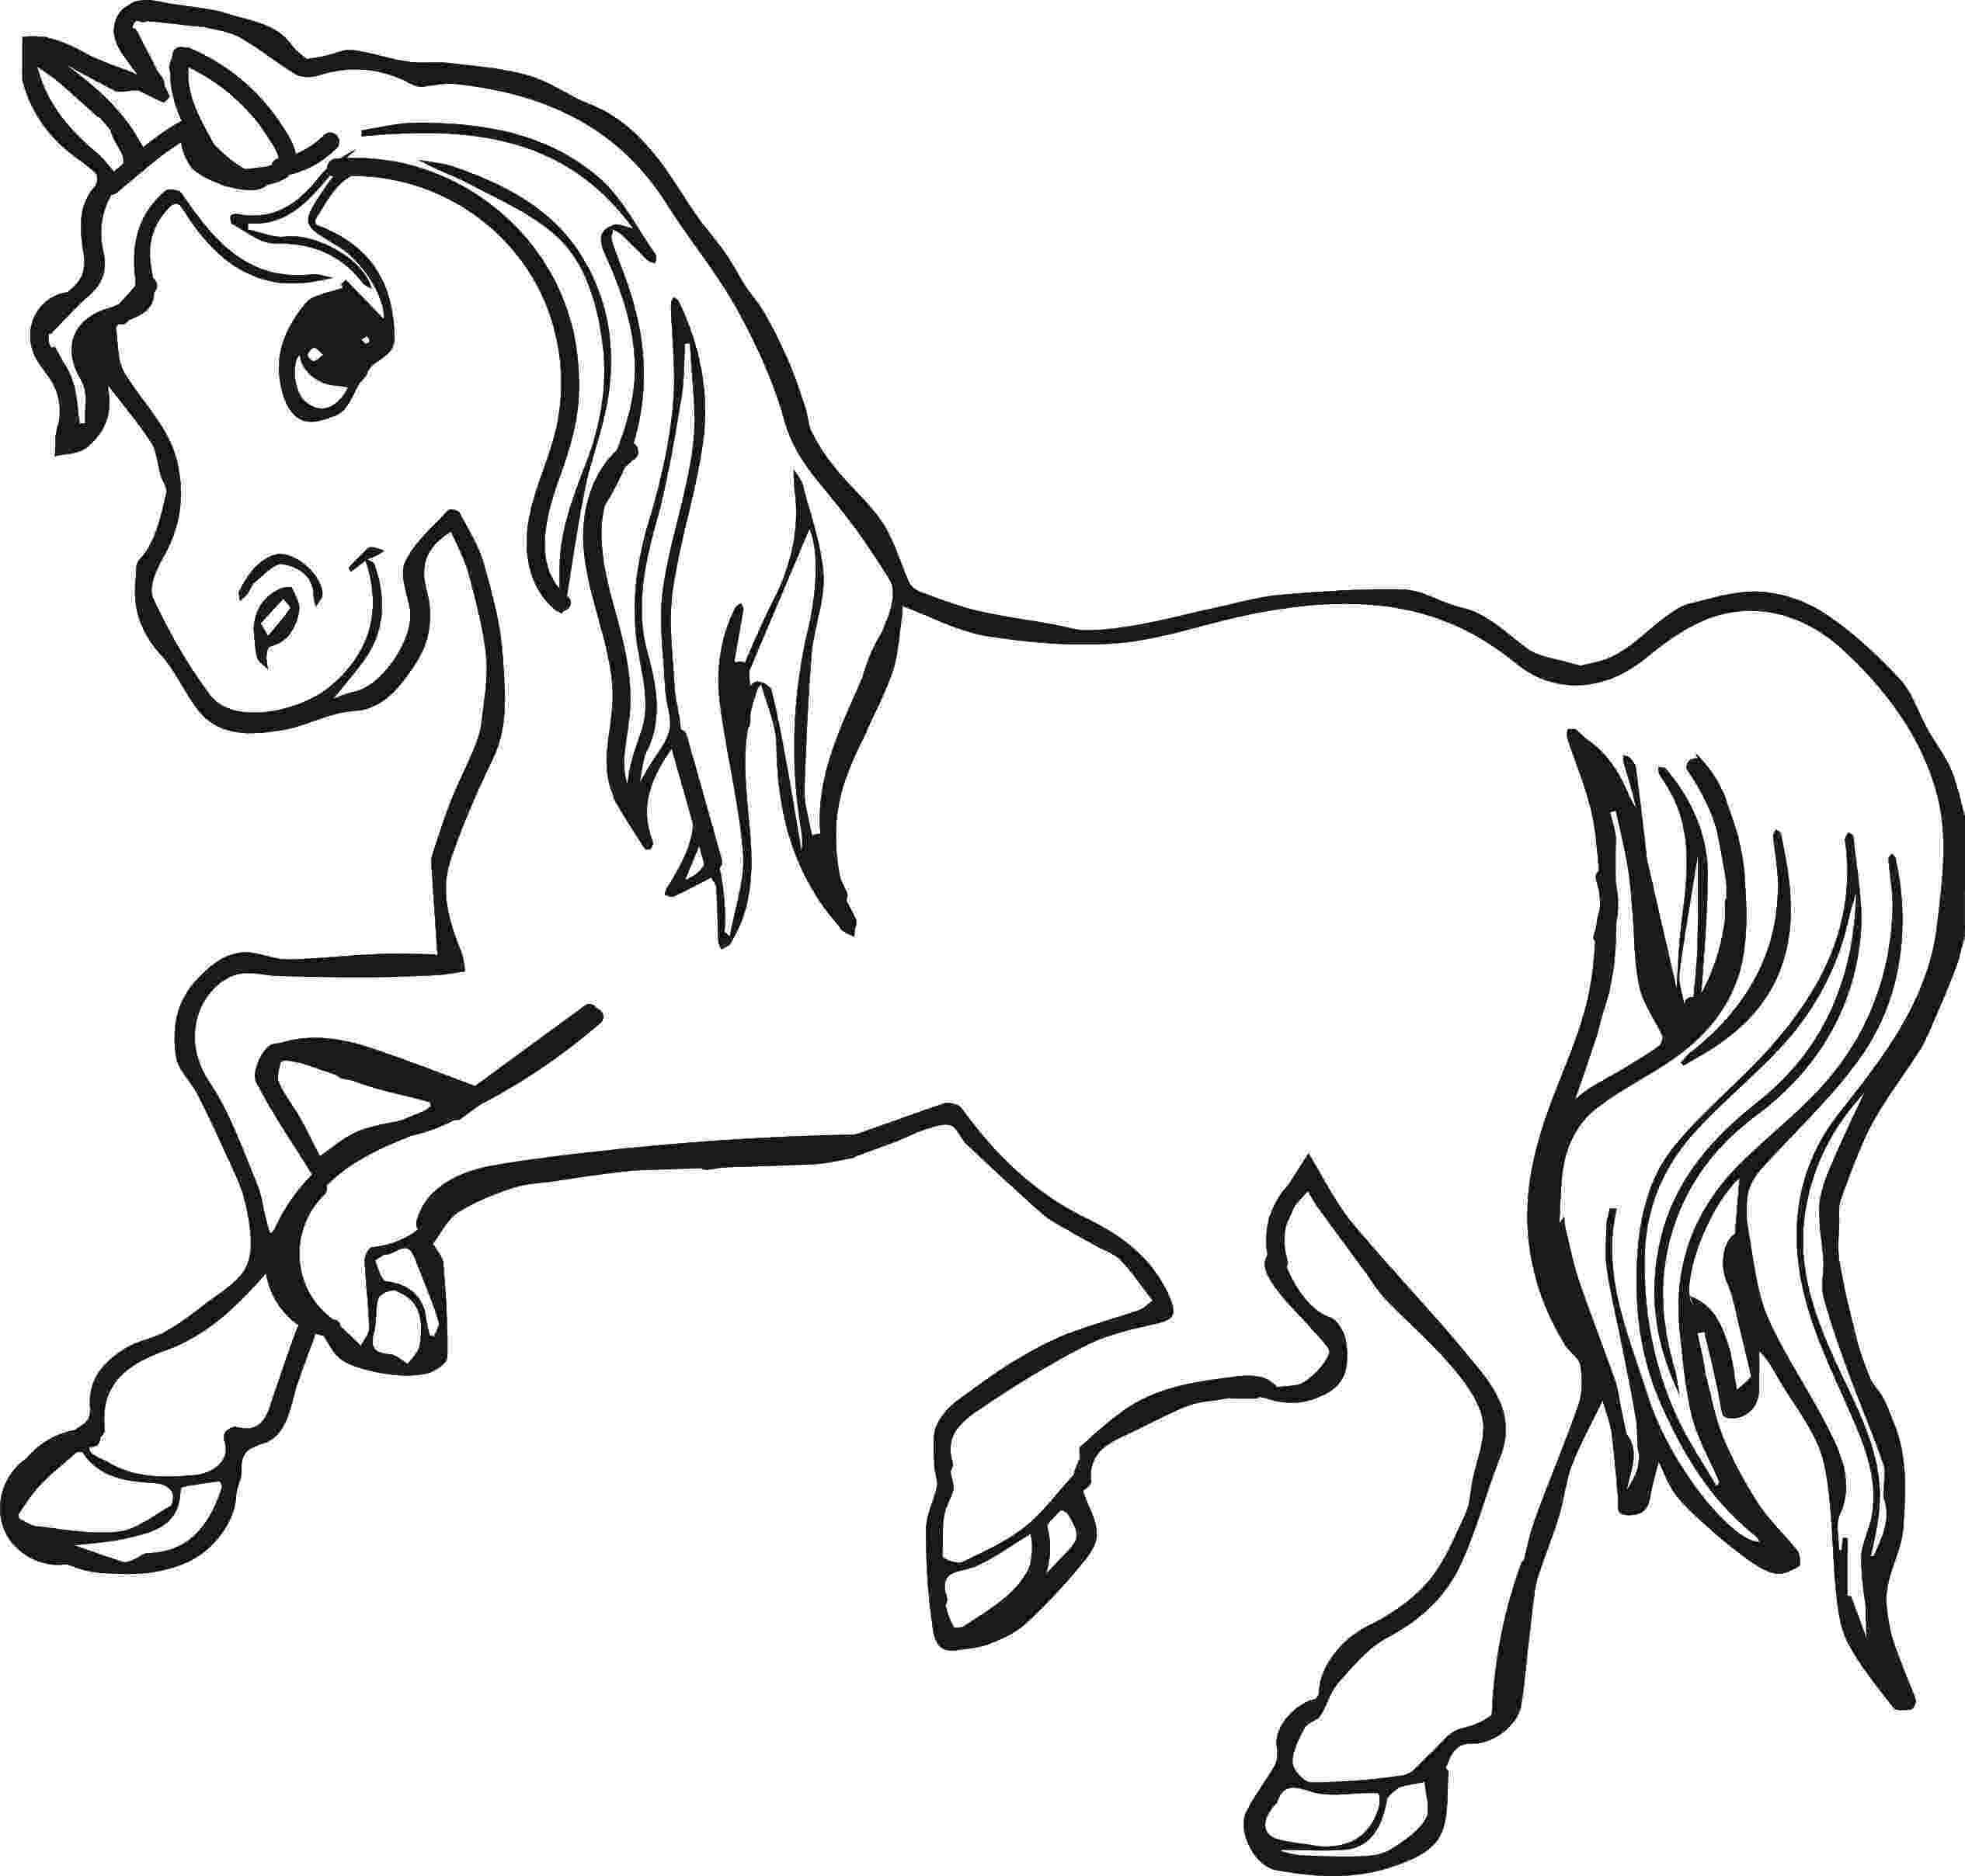 coloring pics of horses horse coloring pages preschool and kindergarten coloring horses of pics